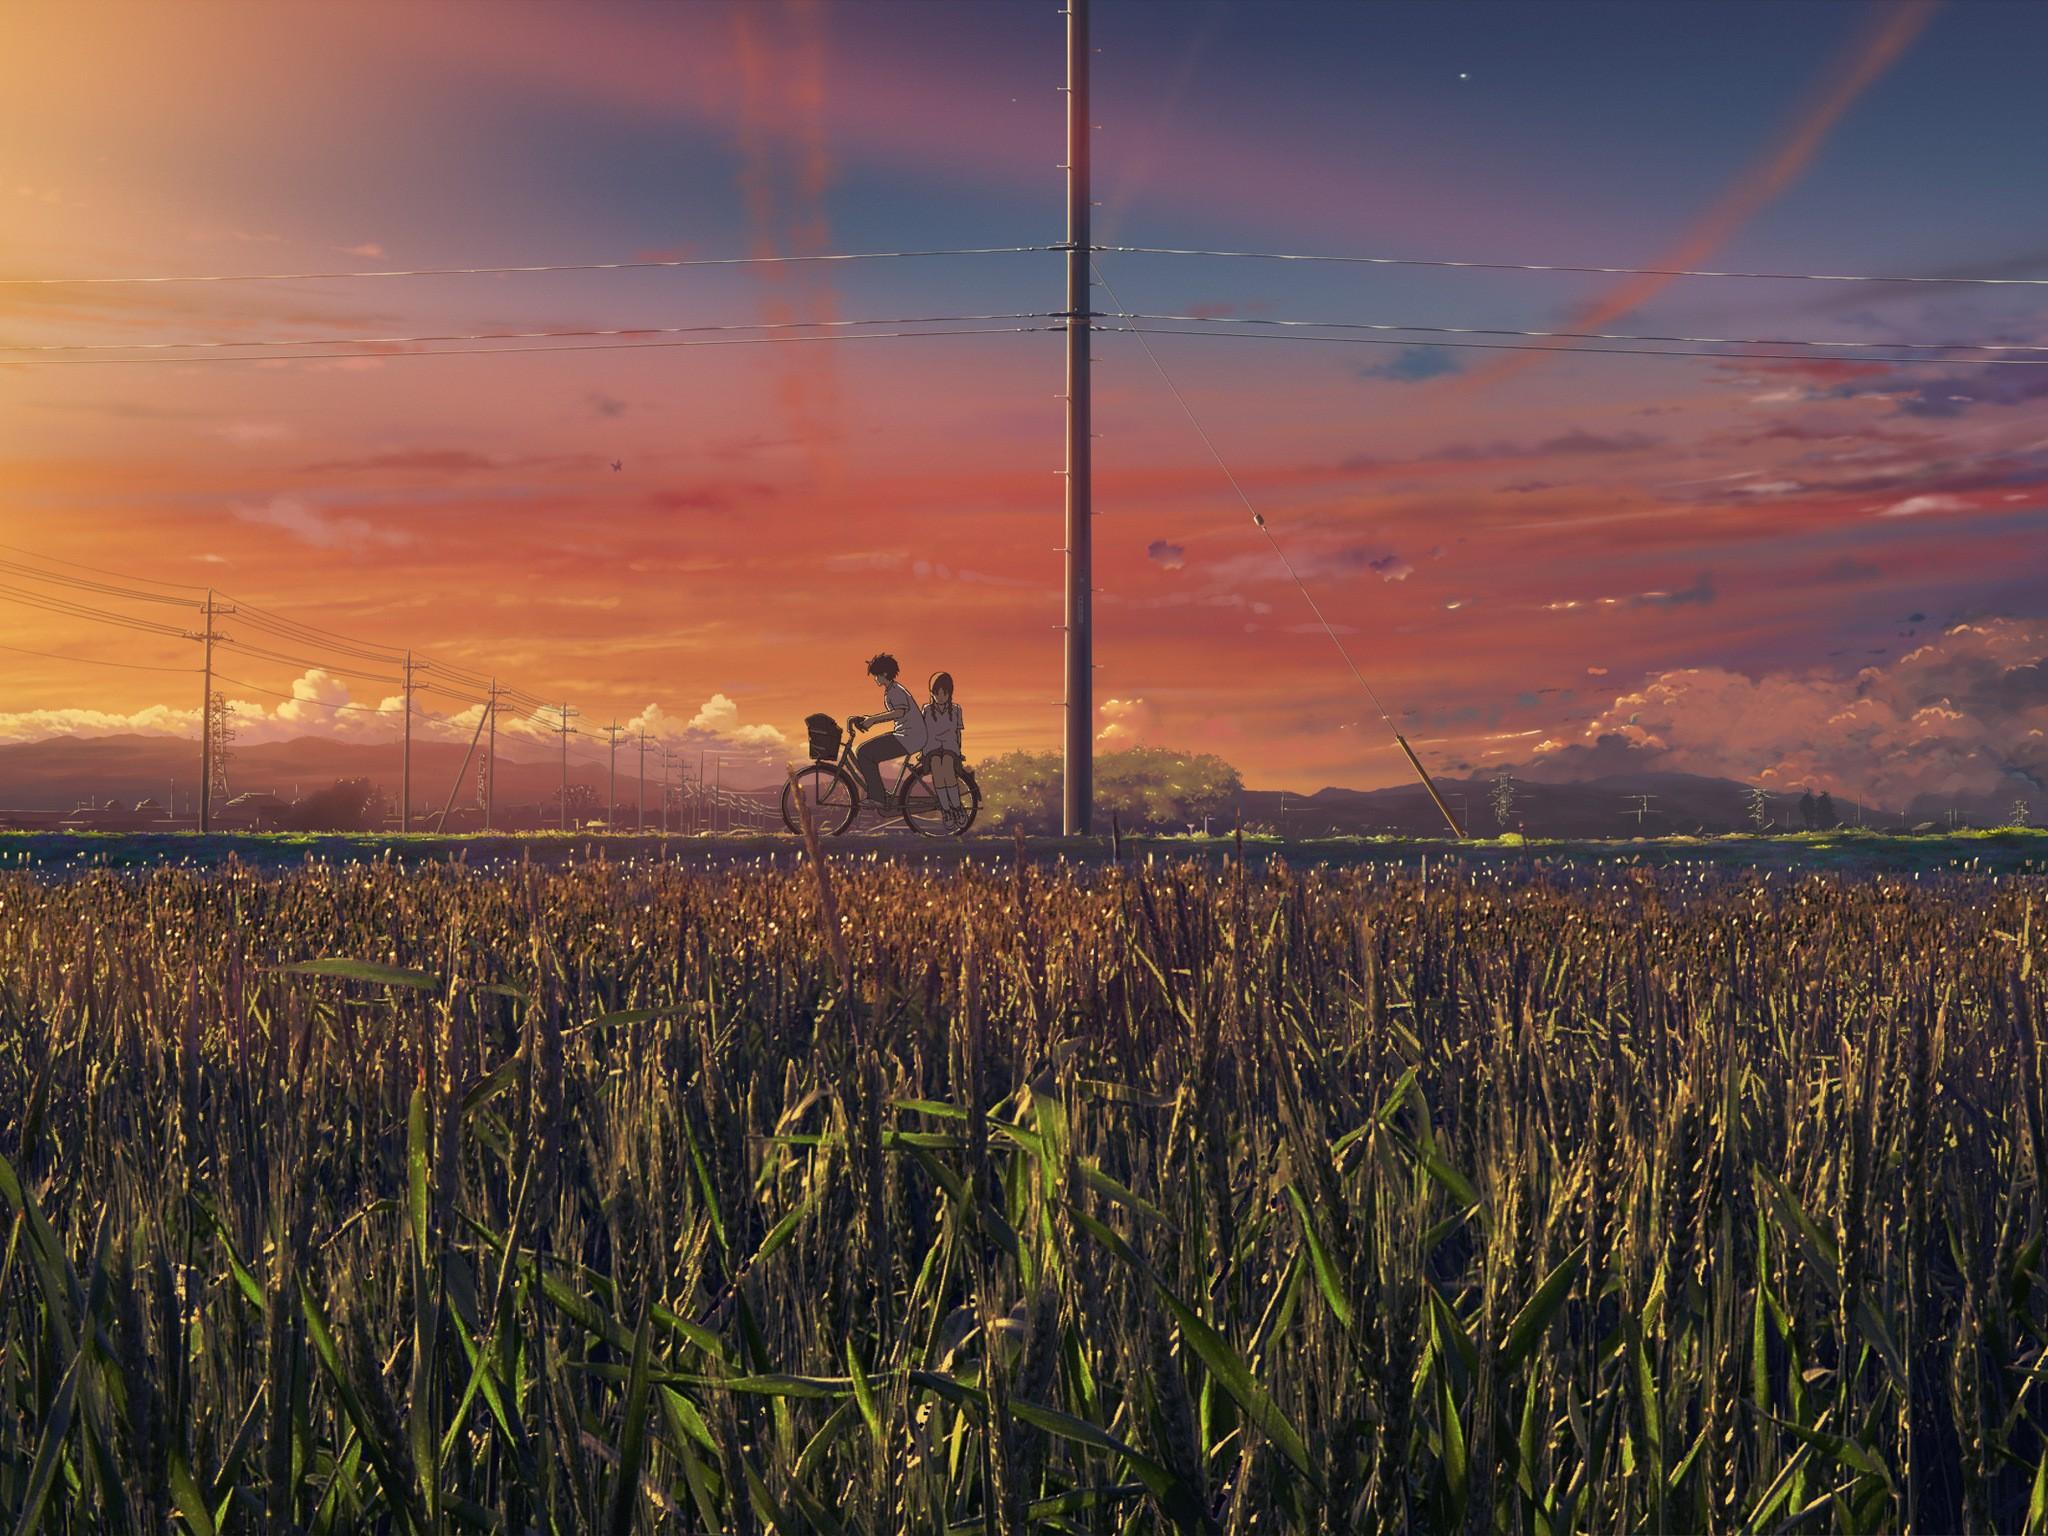 Anime 2048x1536 anime field sky plants outdoors vehicle bicycle anime girls anime boys sunlight